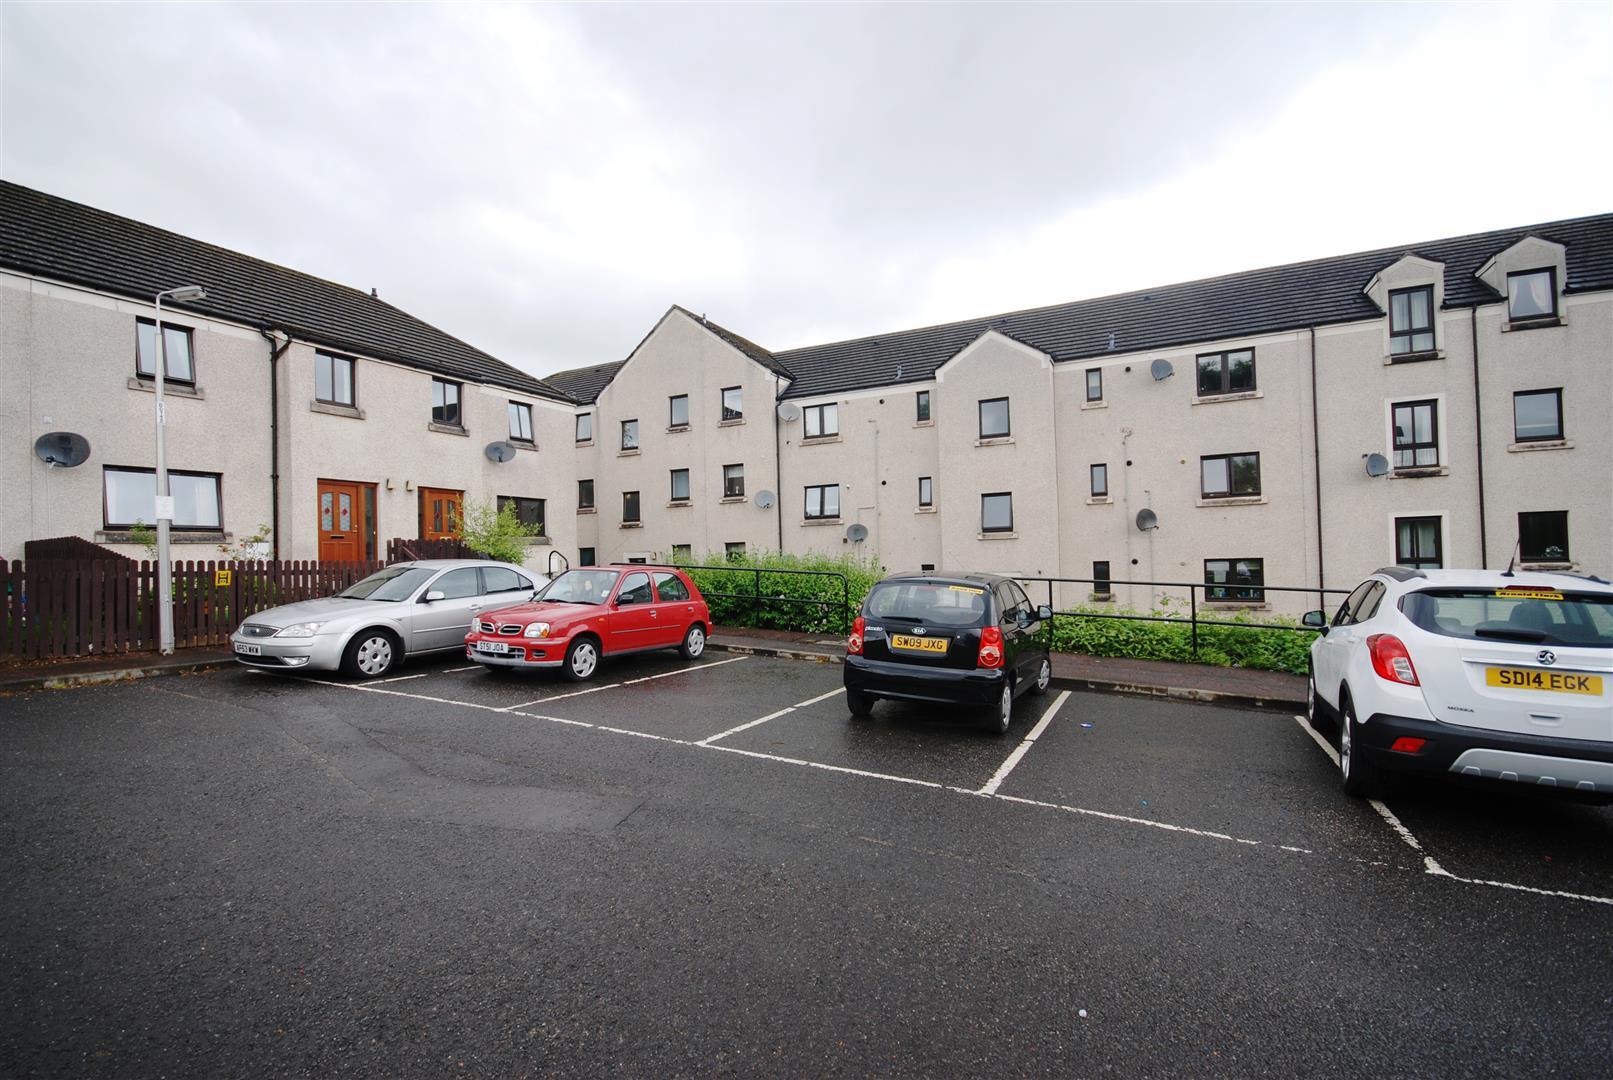 Flat 32, Grampian Court, Crieff Road, Perth, Perthshire, PH1 2ST, UK